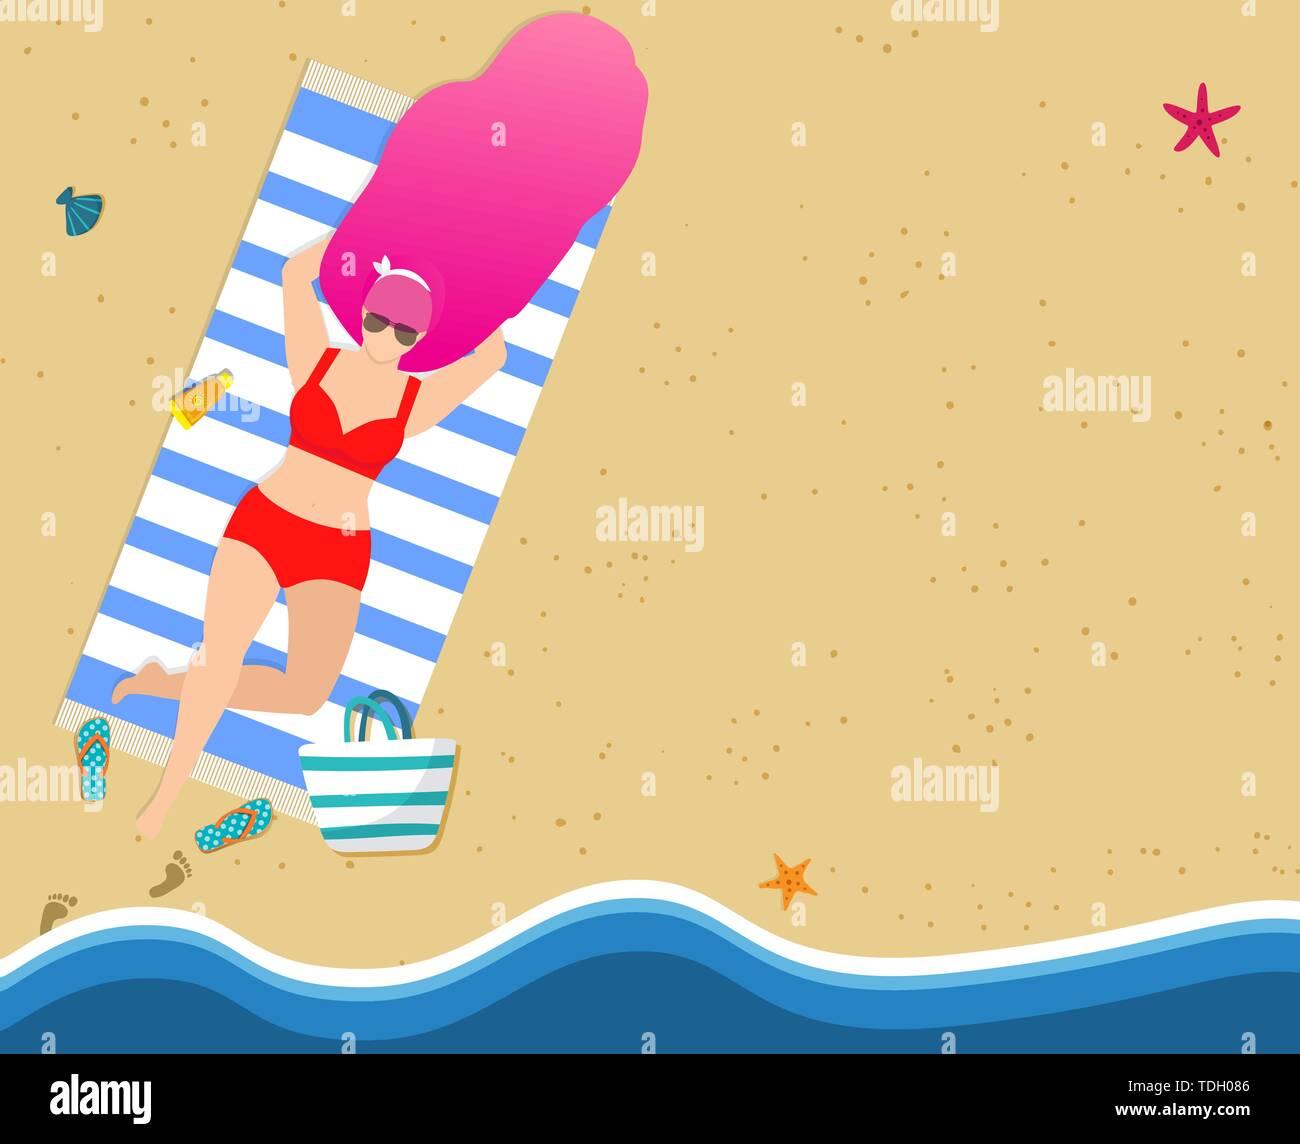 Woman on Summer Beach. Girl in Red Bikini Burn and Relaxing on Sandy Seaside. Summertime Poster Design, Leisure, Resort Sparetime. Female Character Re - Stock Vector